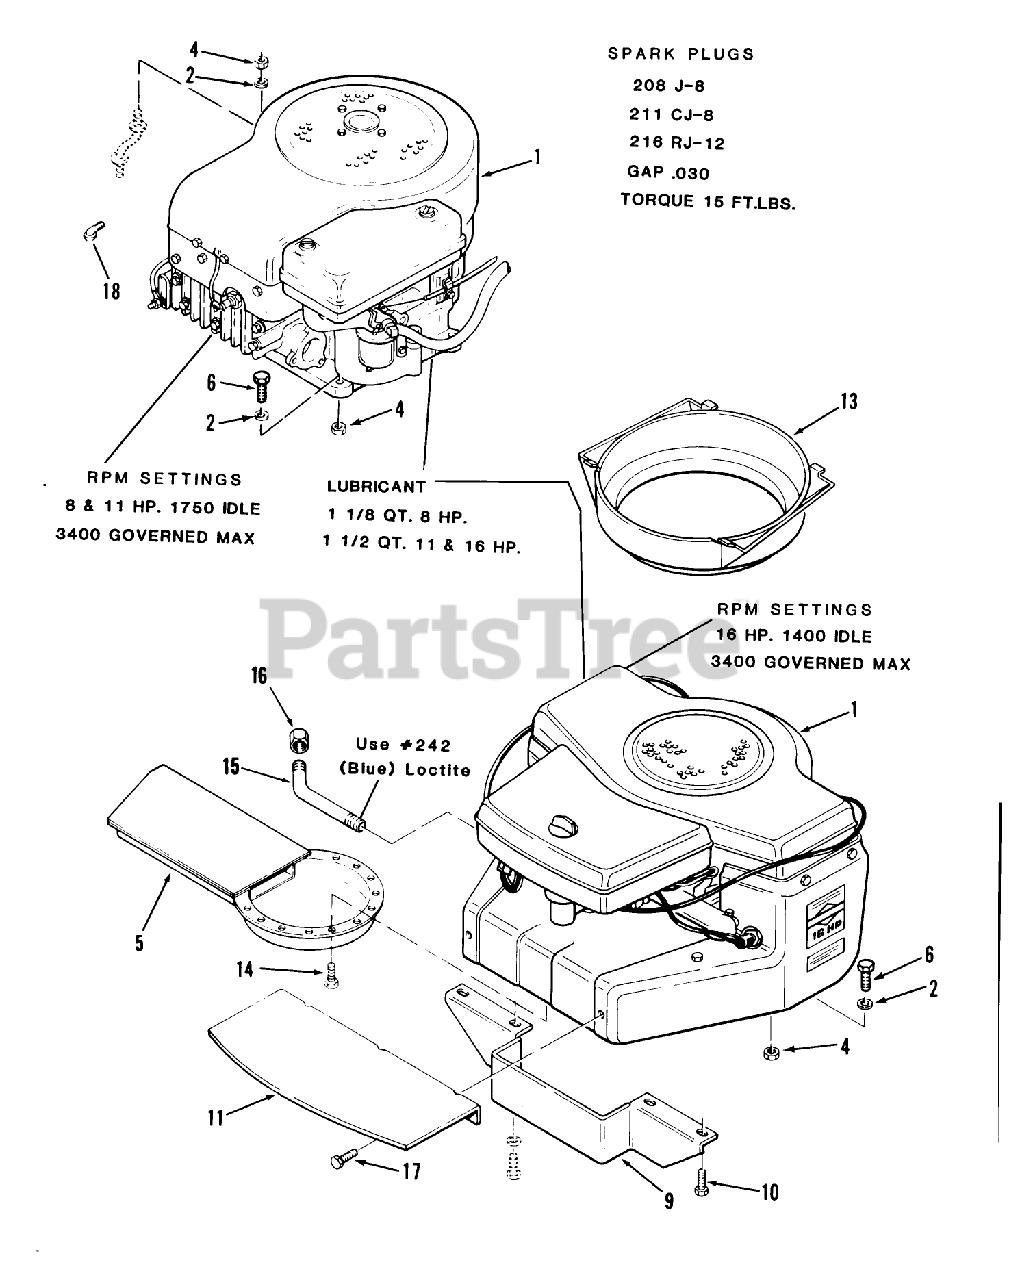 Toro Wheel Horse Parts Lookup : wheel, horse, parts, lookup, B2-16B591, (216-5), Tractor, (1987), ENGINE, Parts, Lookup, Diagrams, PartsTree